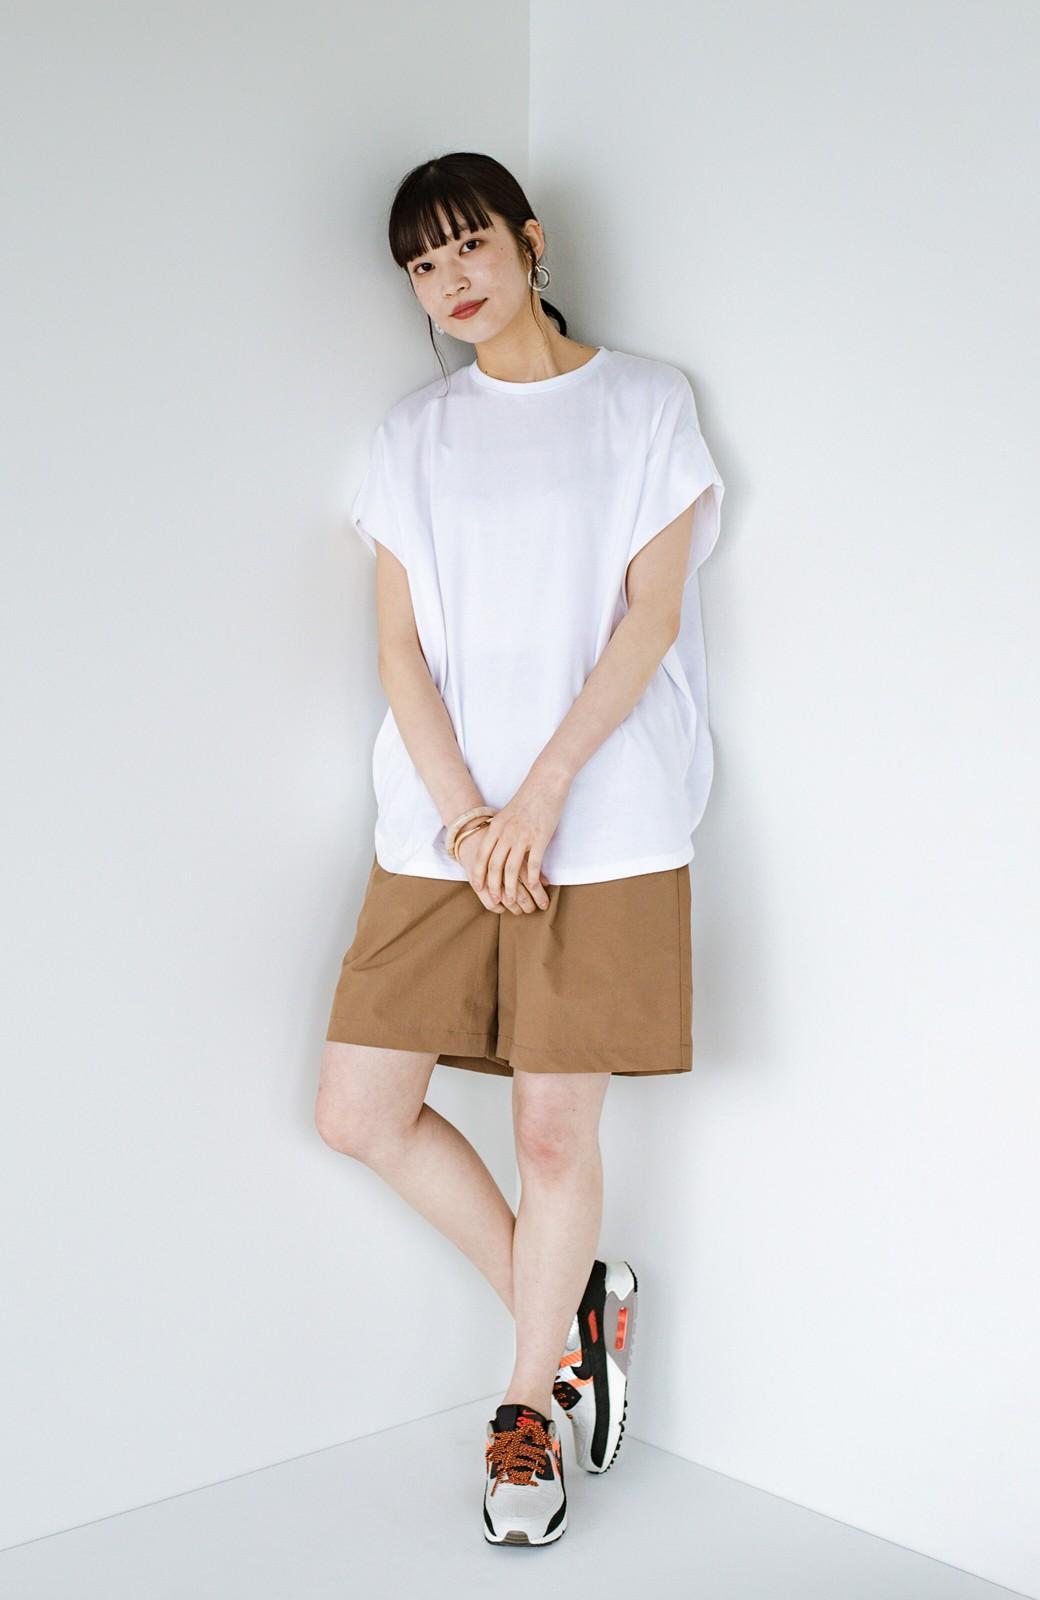 haco! PBPオーガニックコットン 楽ちんなのにブラウス気分で着られる大人のおめかしTシャツ <ホワイト>の商品写真6